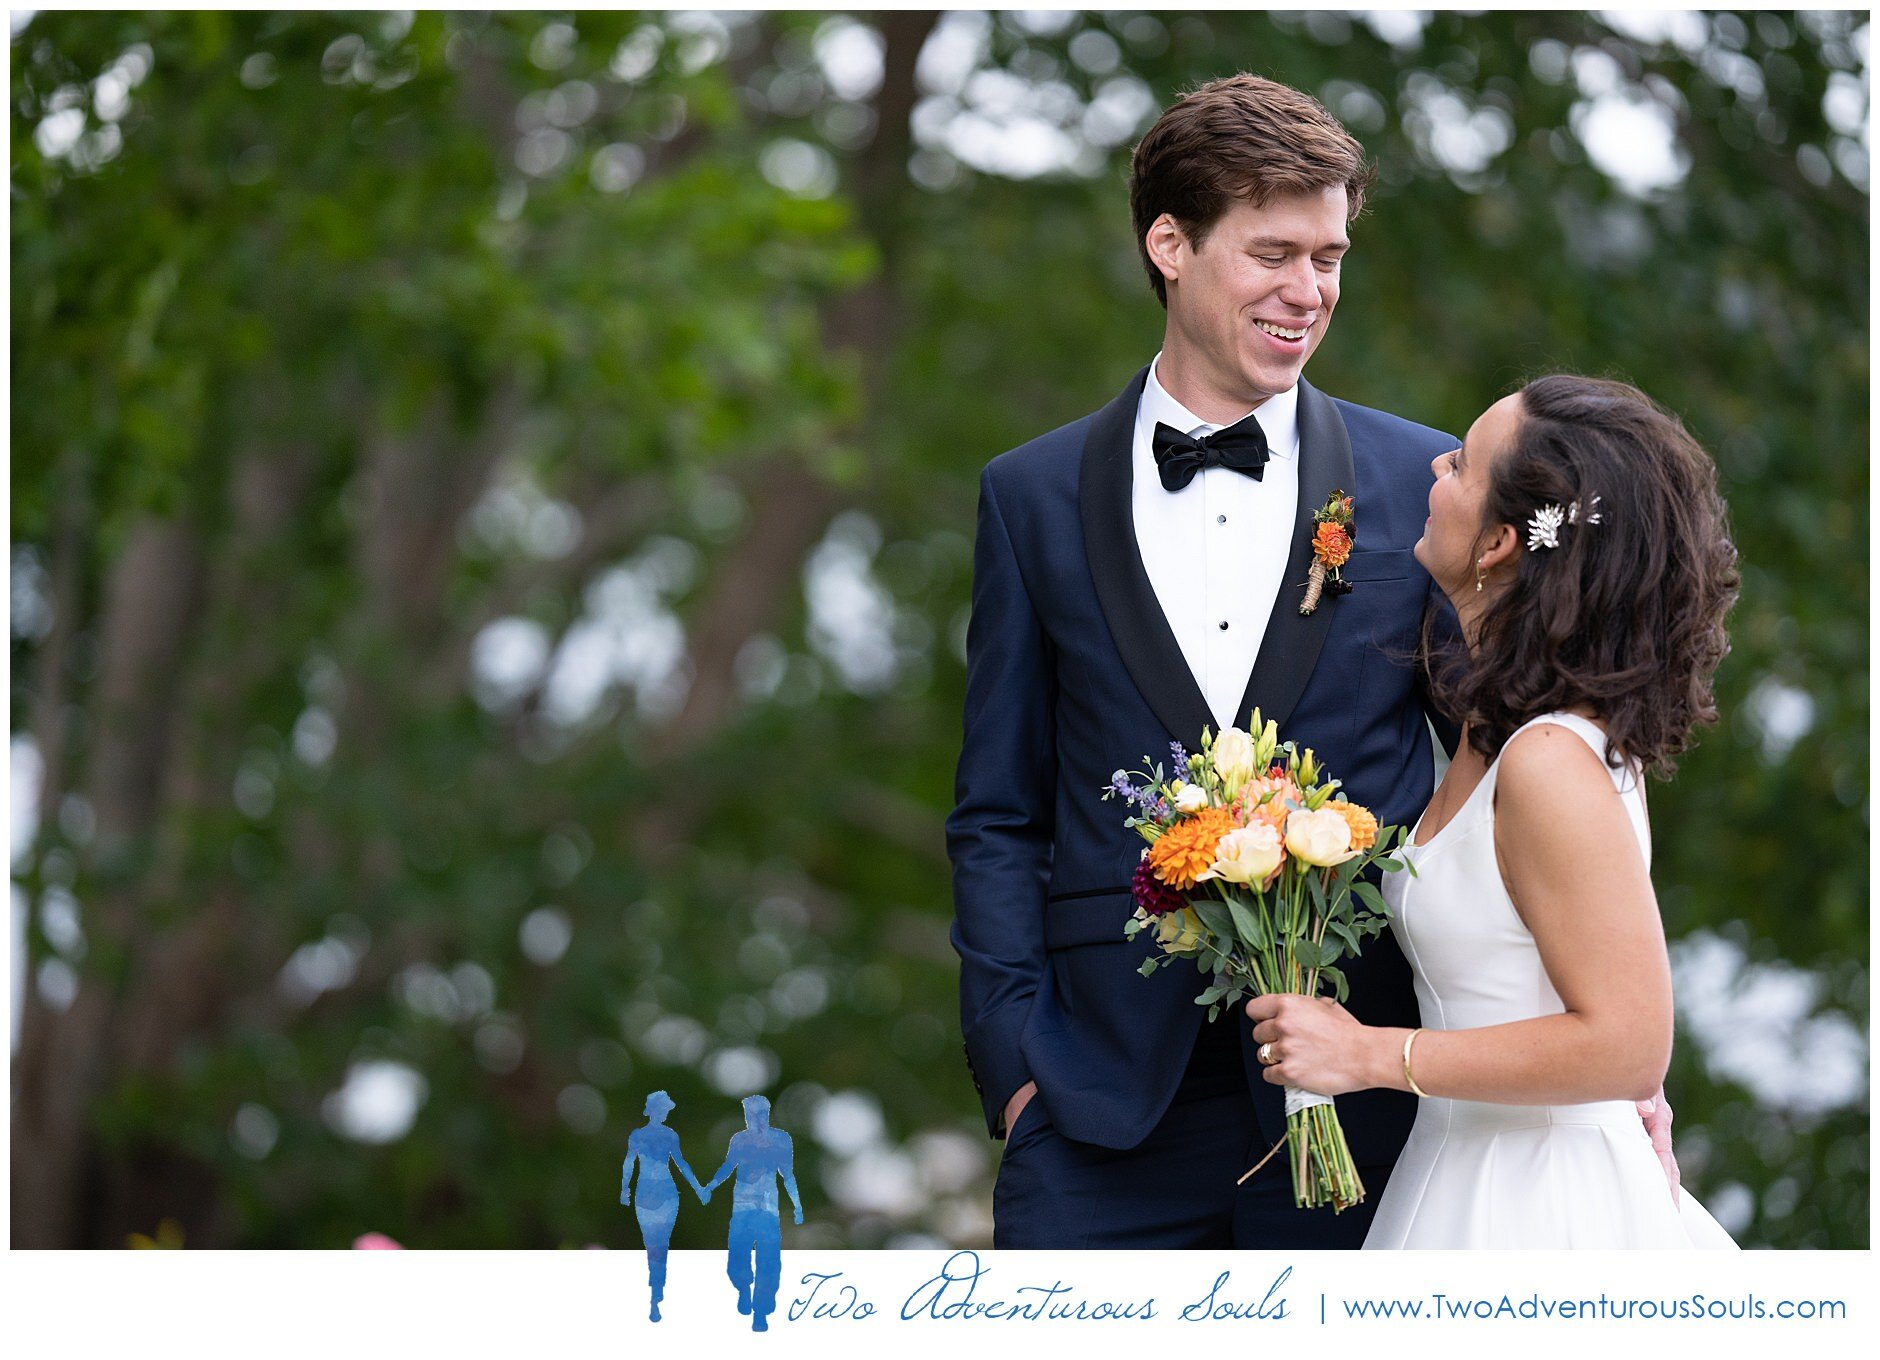 Bar Harbor Wedding Photographers, Acadia Bay Inn Wedding Photographers, Two Adventurous Souls- 091419_0028.jpg